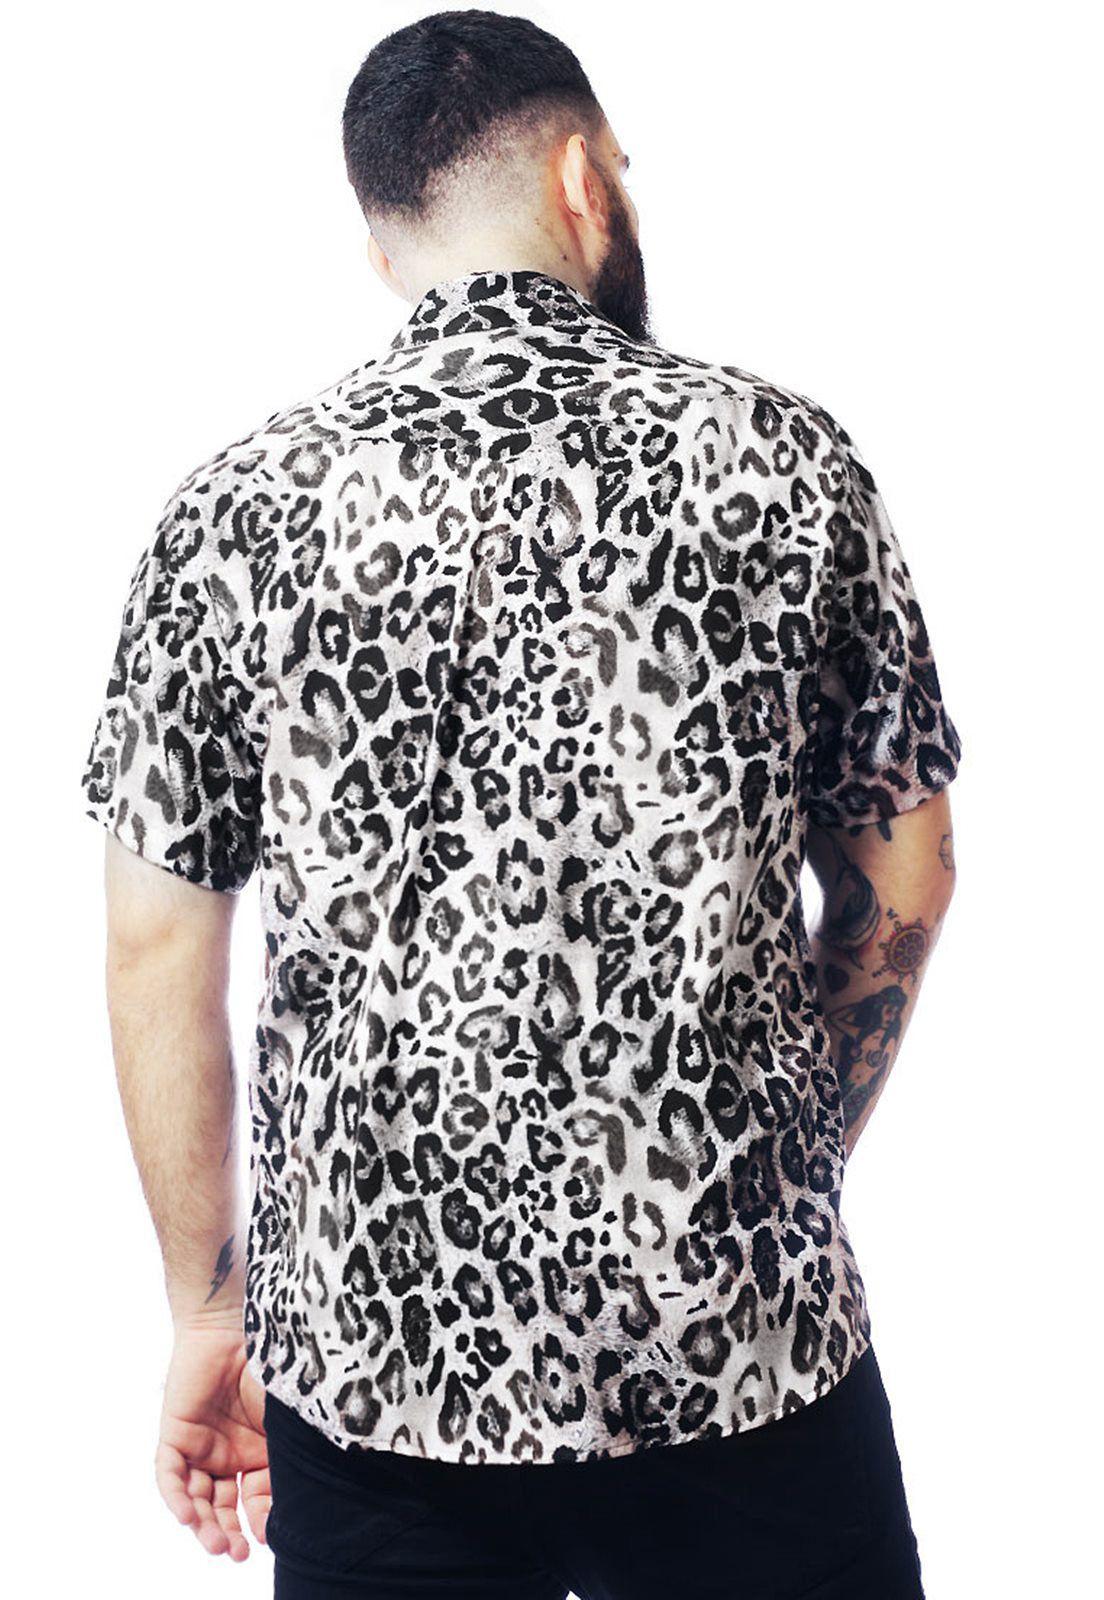 Camisa Animal Print Estampada ElephunK Leopardo Cinza